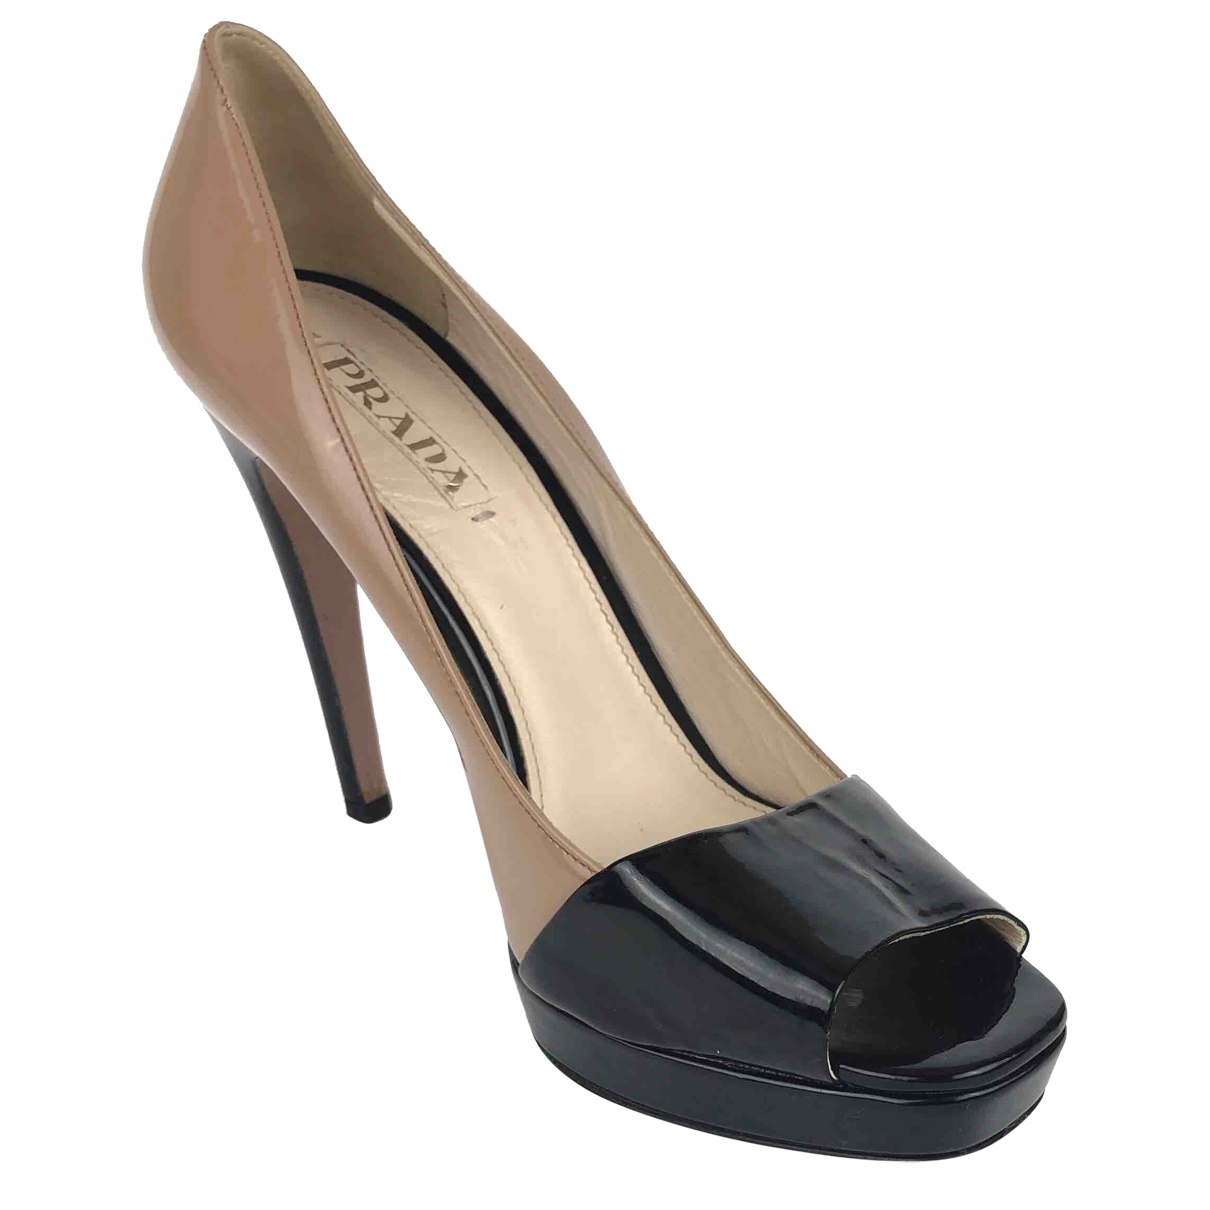 Prada \N Beige Patent leather Heels for Women 40.5 EU